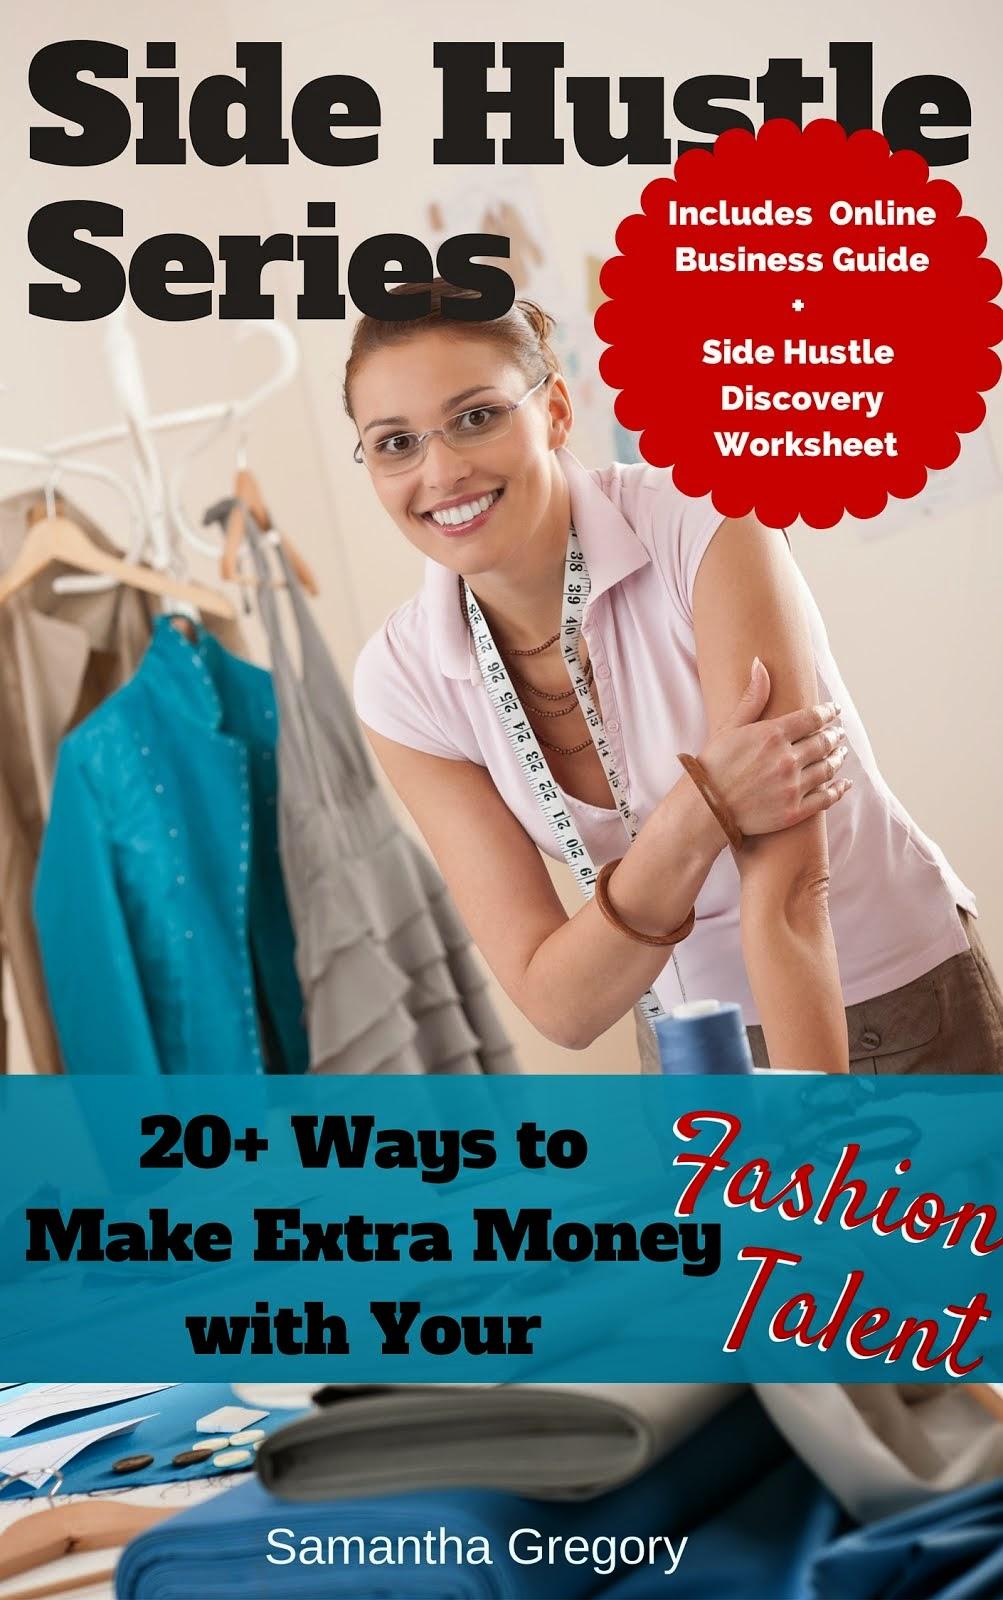 Side Hustles for Fashion Lovers